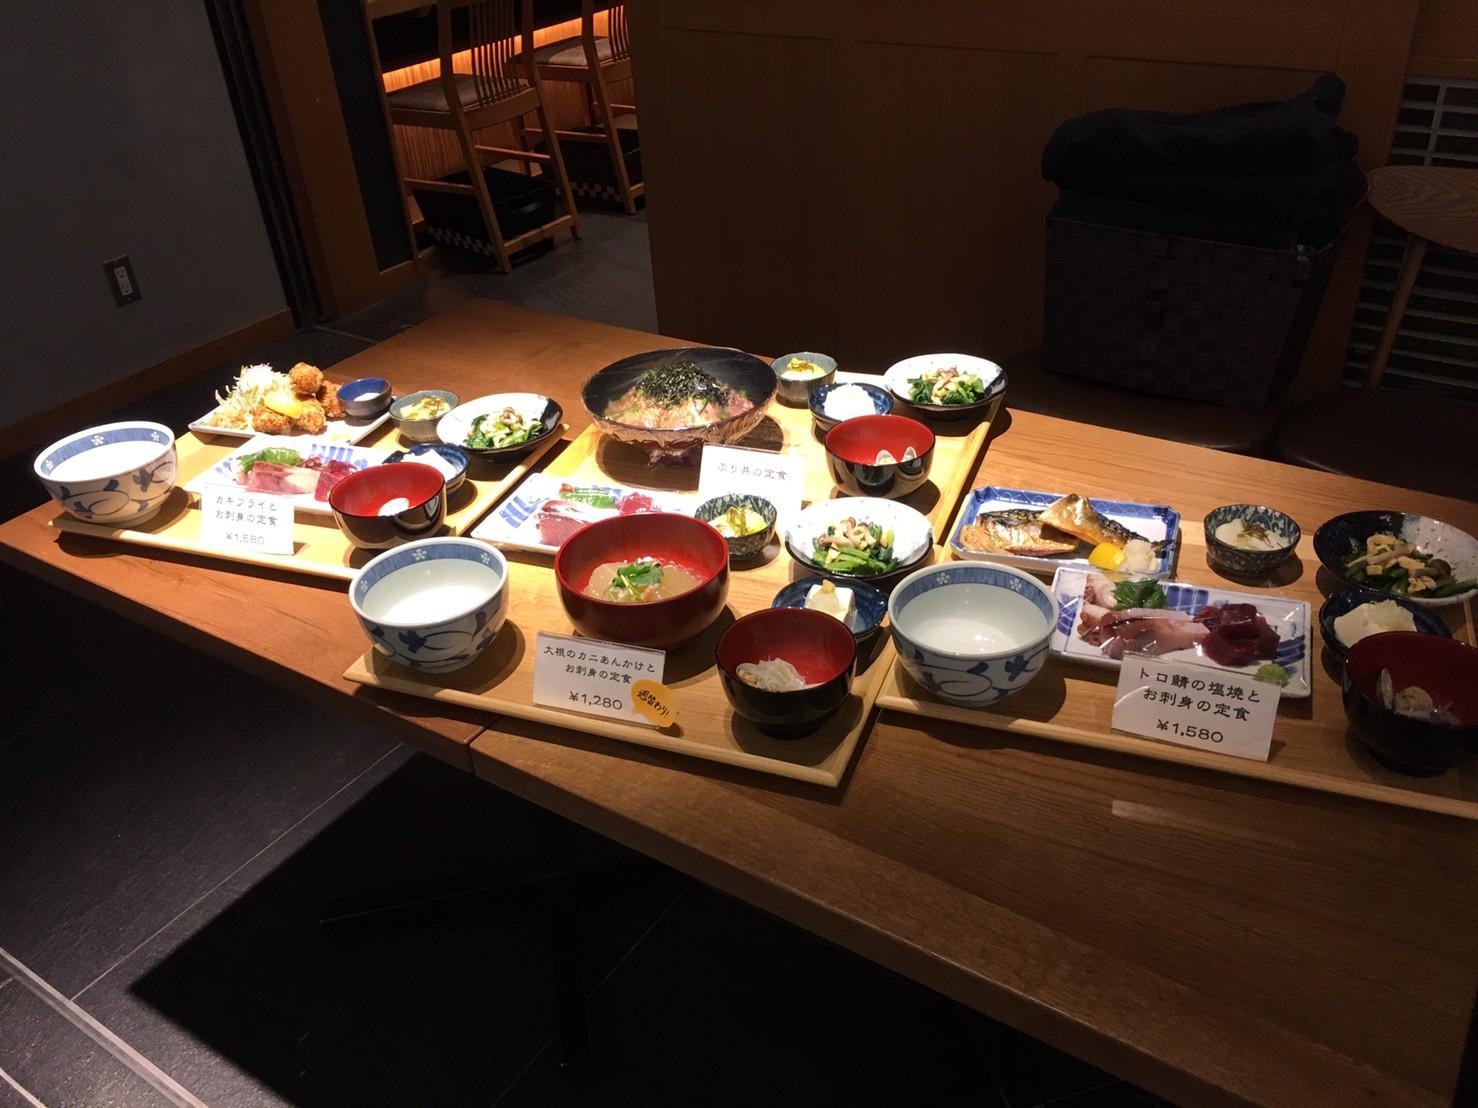 ムスブ田町 魚金 店内料理見本